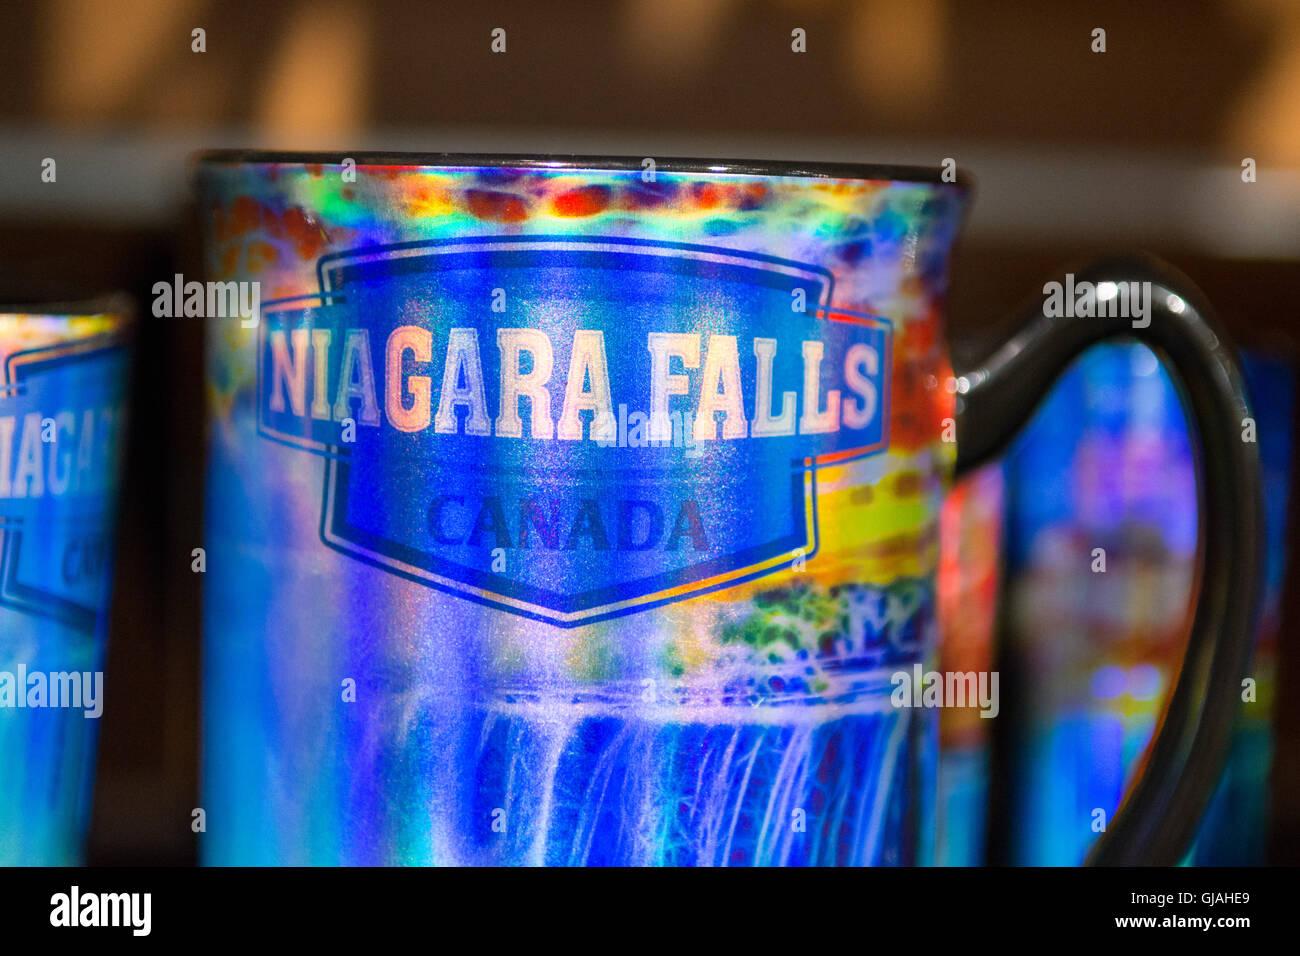 Niagara Falls souvenirs - Stock Image